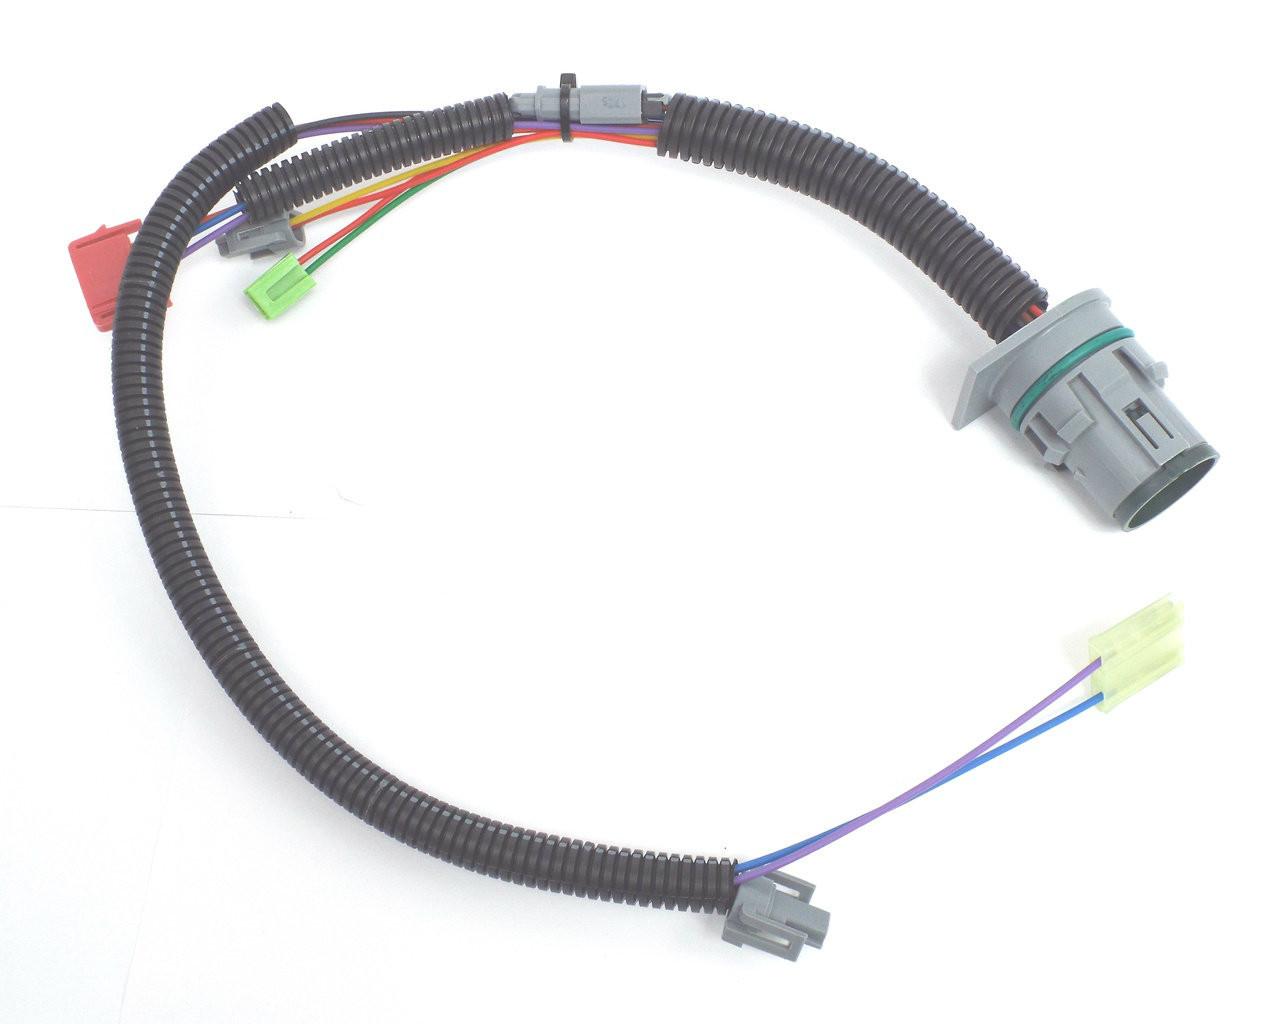 hight resolution of new 4l80e transmission hd internal valve body wiring harness 1991 2003 4l80e internal wiring harness diagram 4l80e internal wiring harness